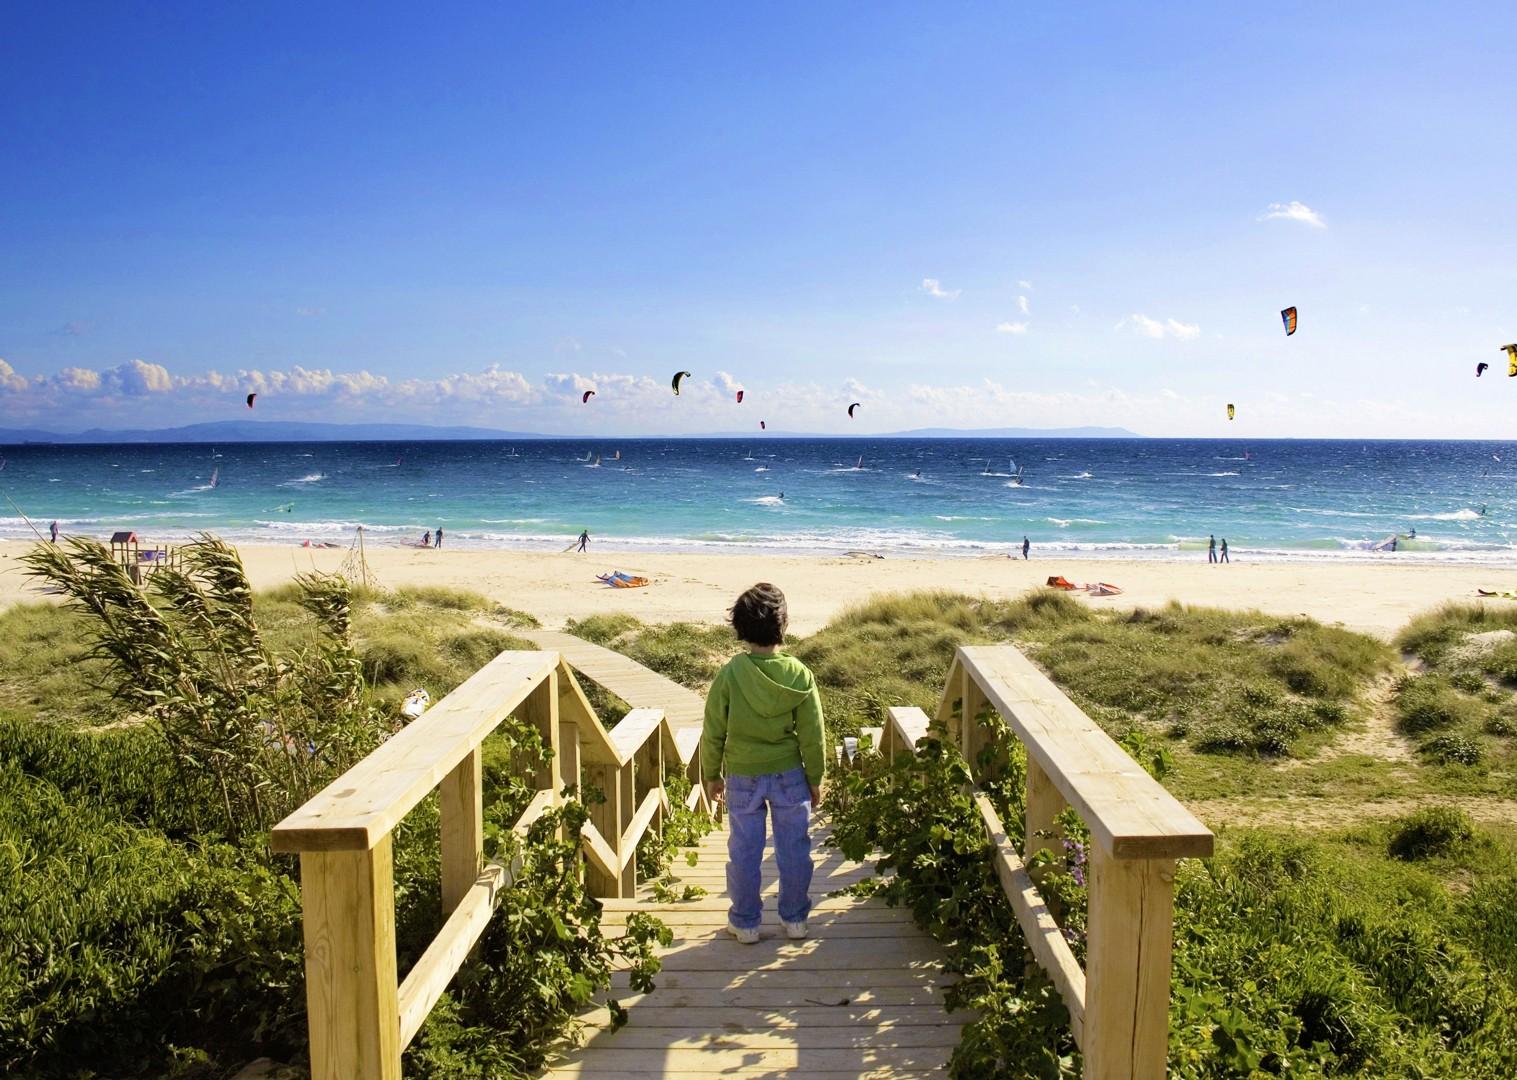 beach-family-straits-of-gibraltar-cycling-holiday.jpg - Southern Spain - Coastal Adventurer - Self-Guided Family Cycling Holiday - Family Cycling